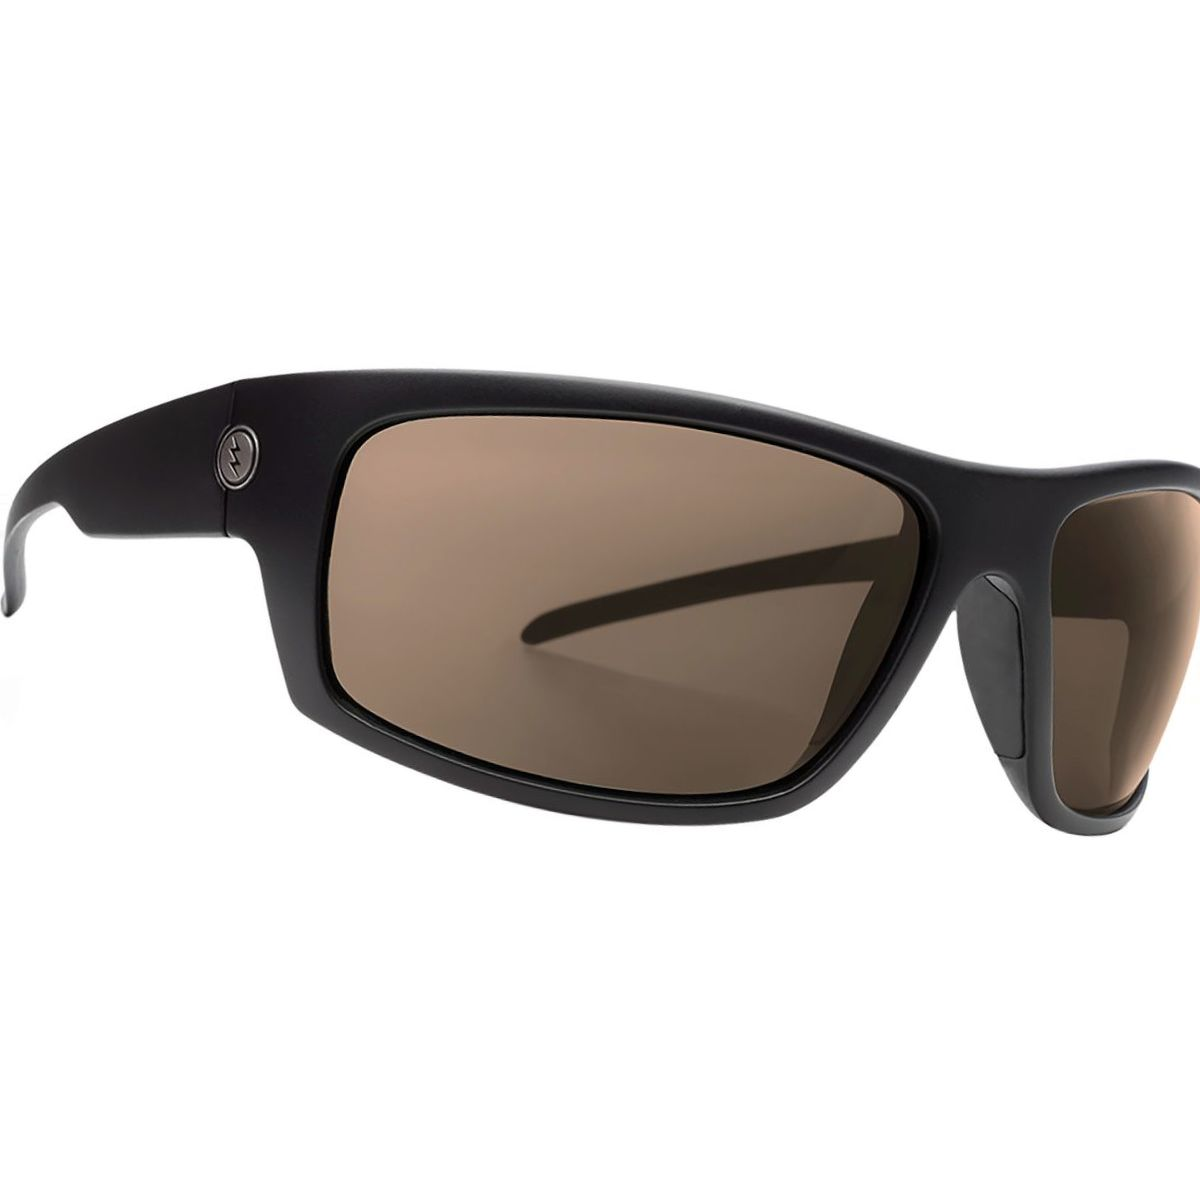 Electric Tech One Polarized Sunglasses - Men's